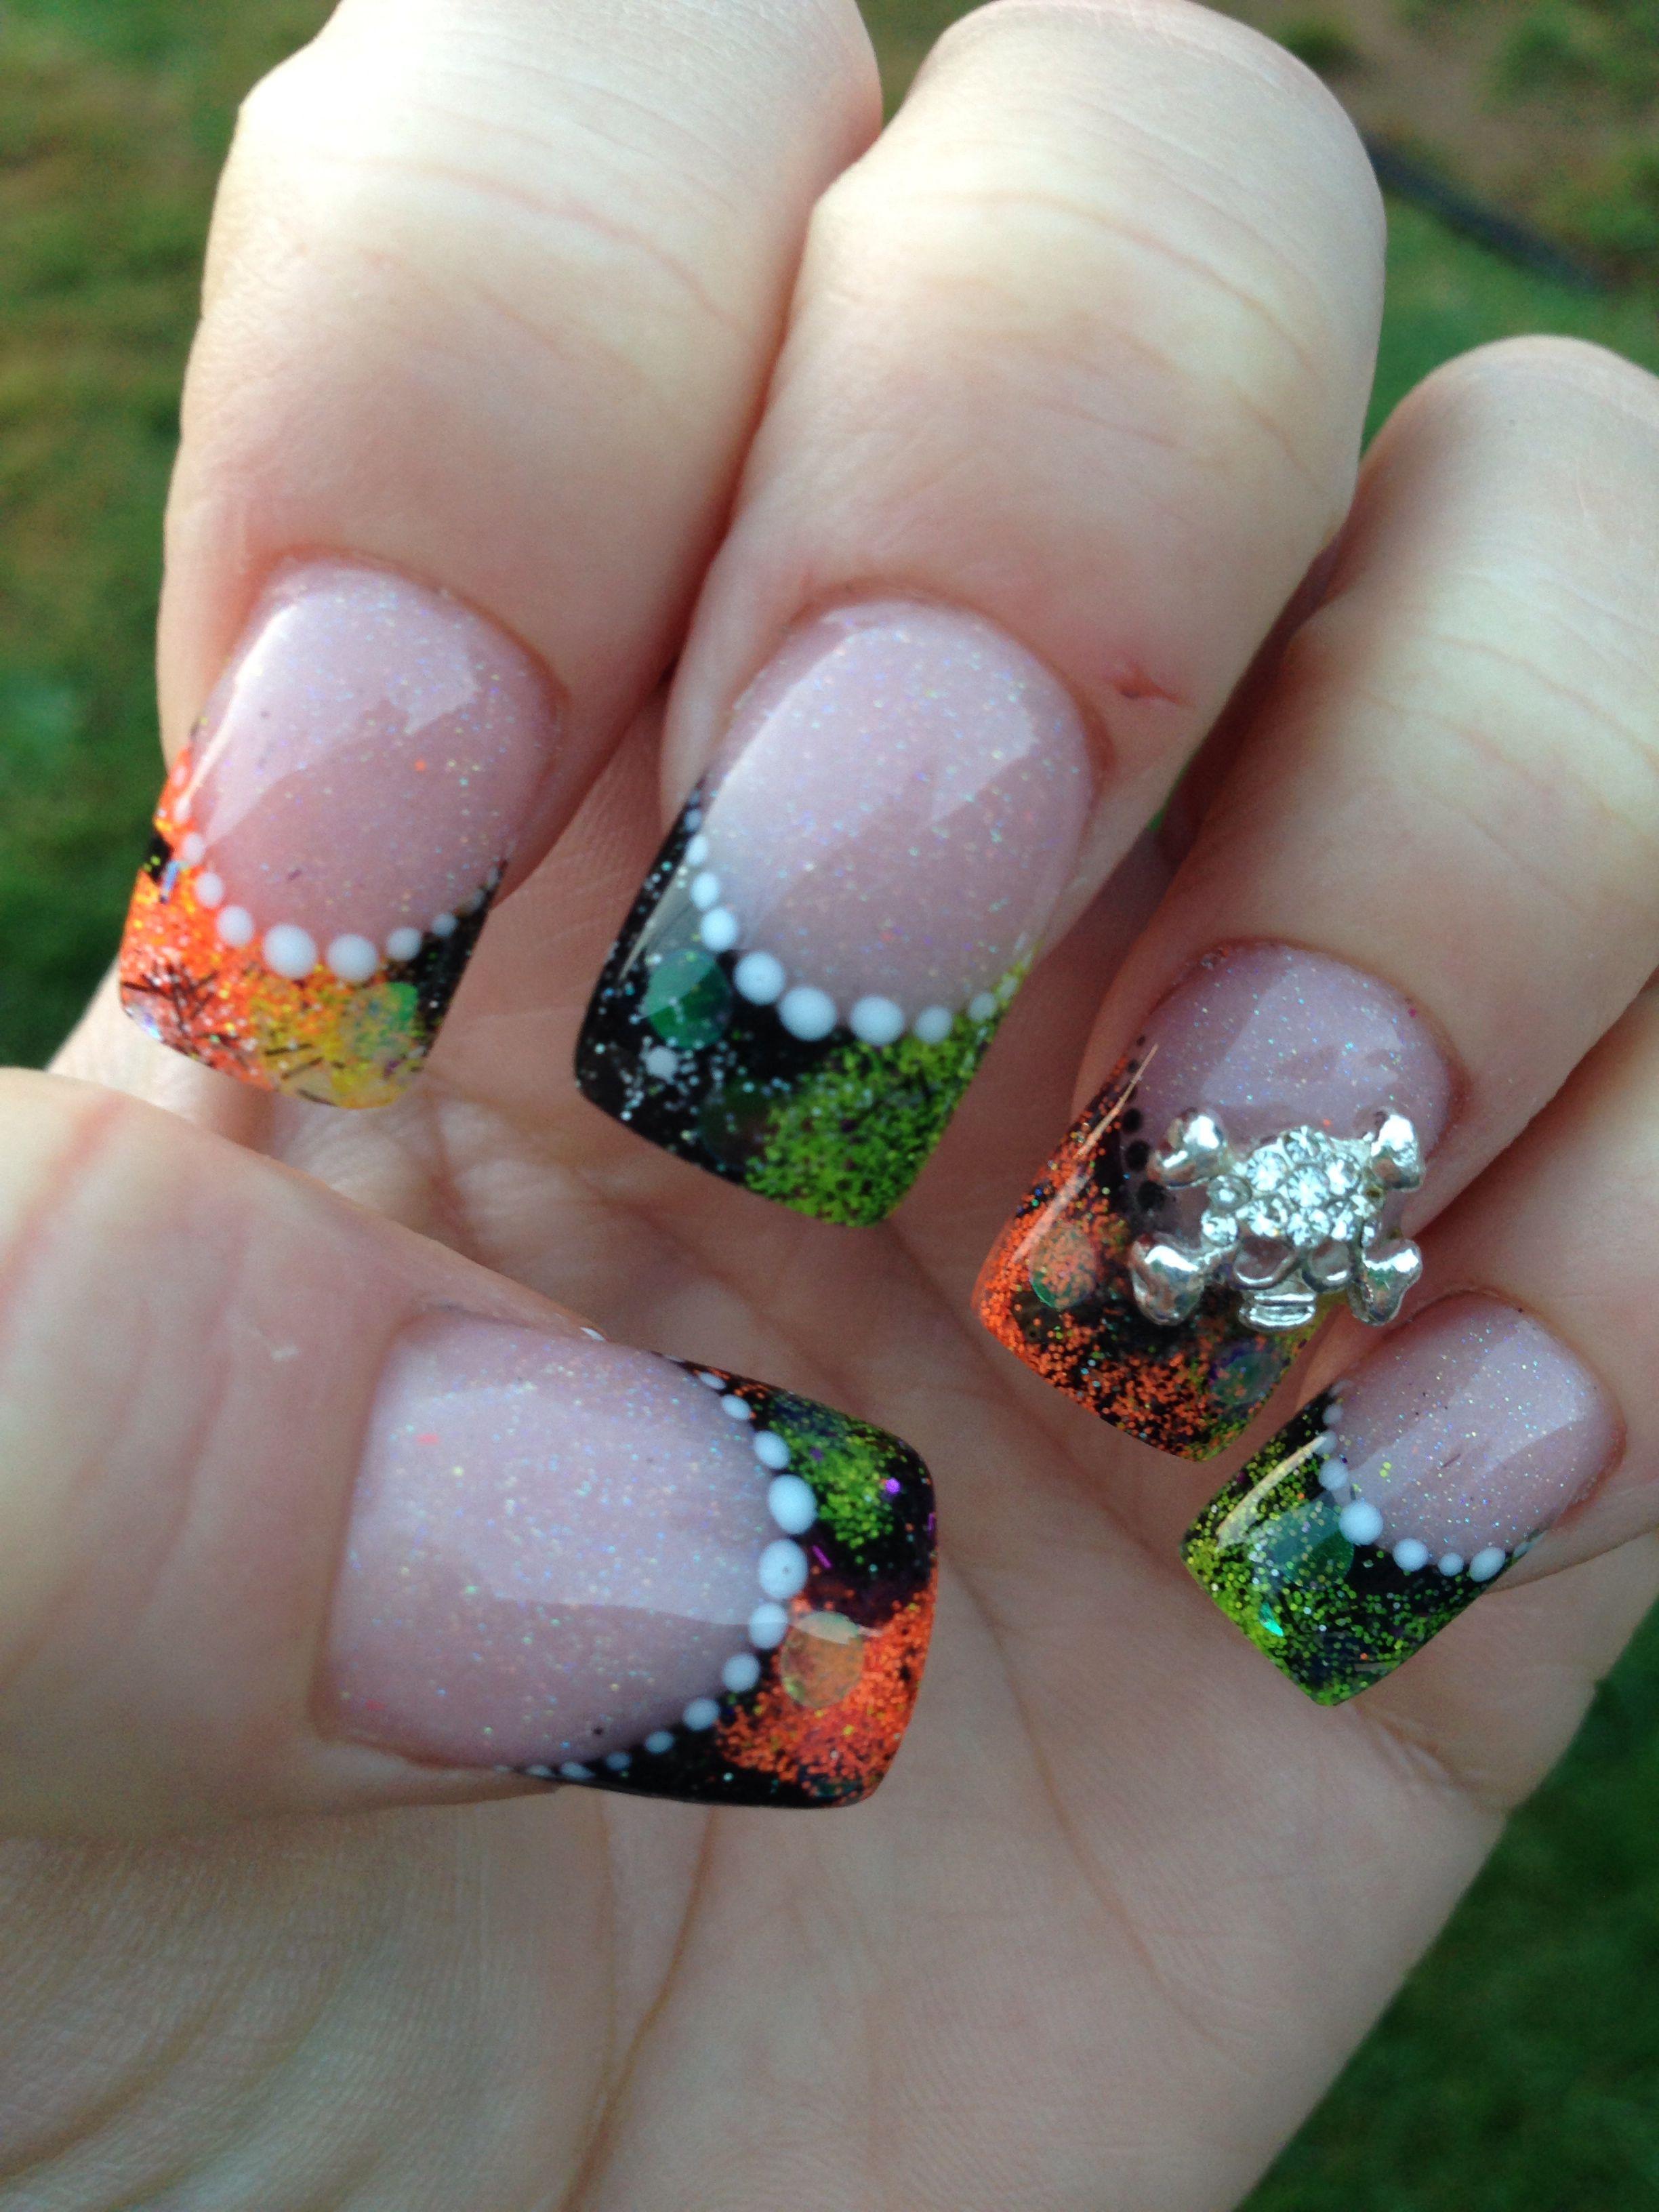 Acrylics nails...perfect design for fall | nail art | Pinterest ...